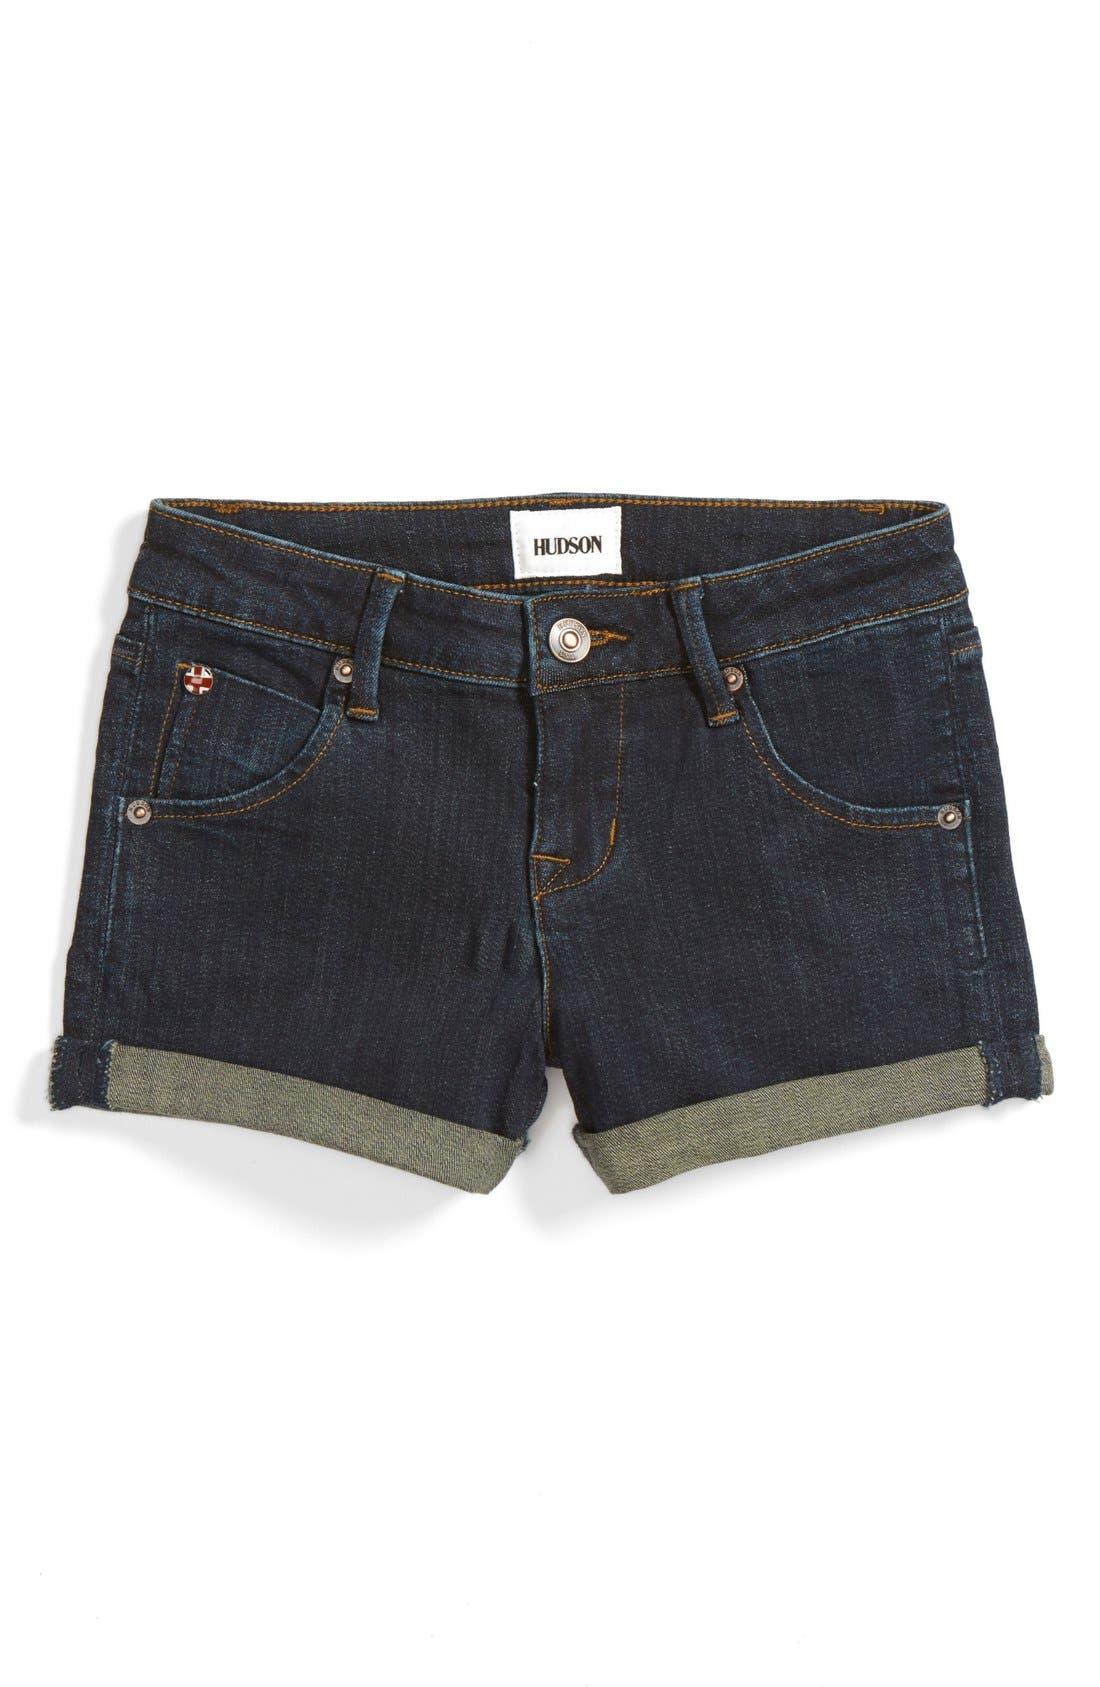 Roll Cuff Denim Shorts,                             Main thumbnail 3, color,